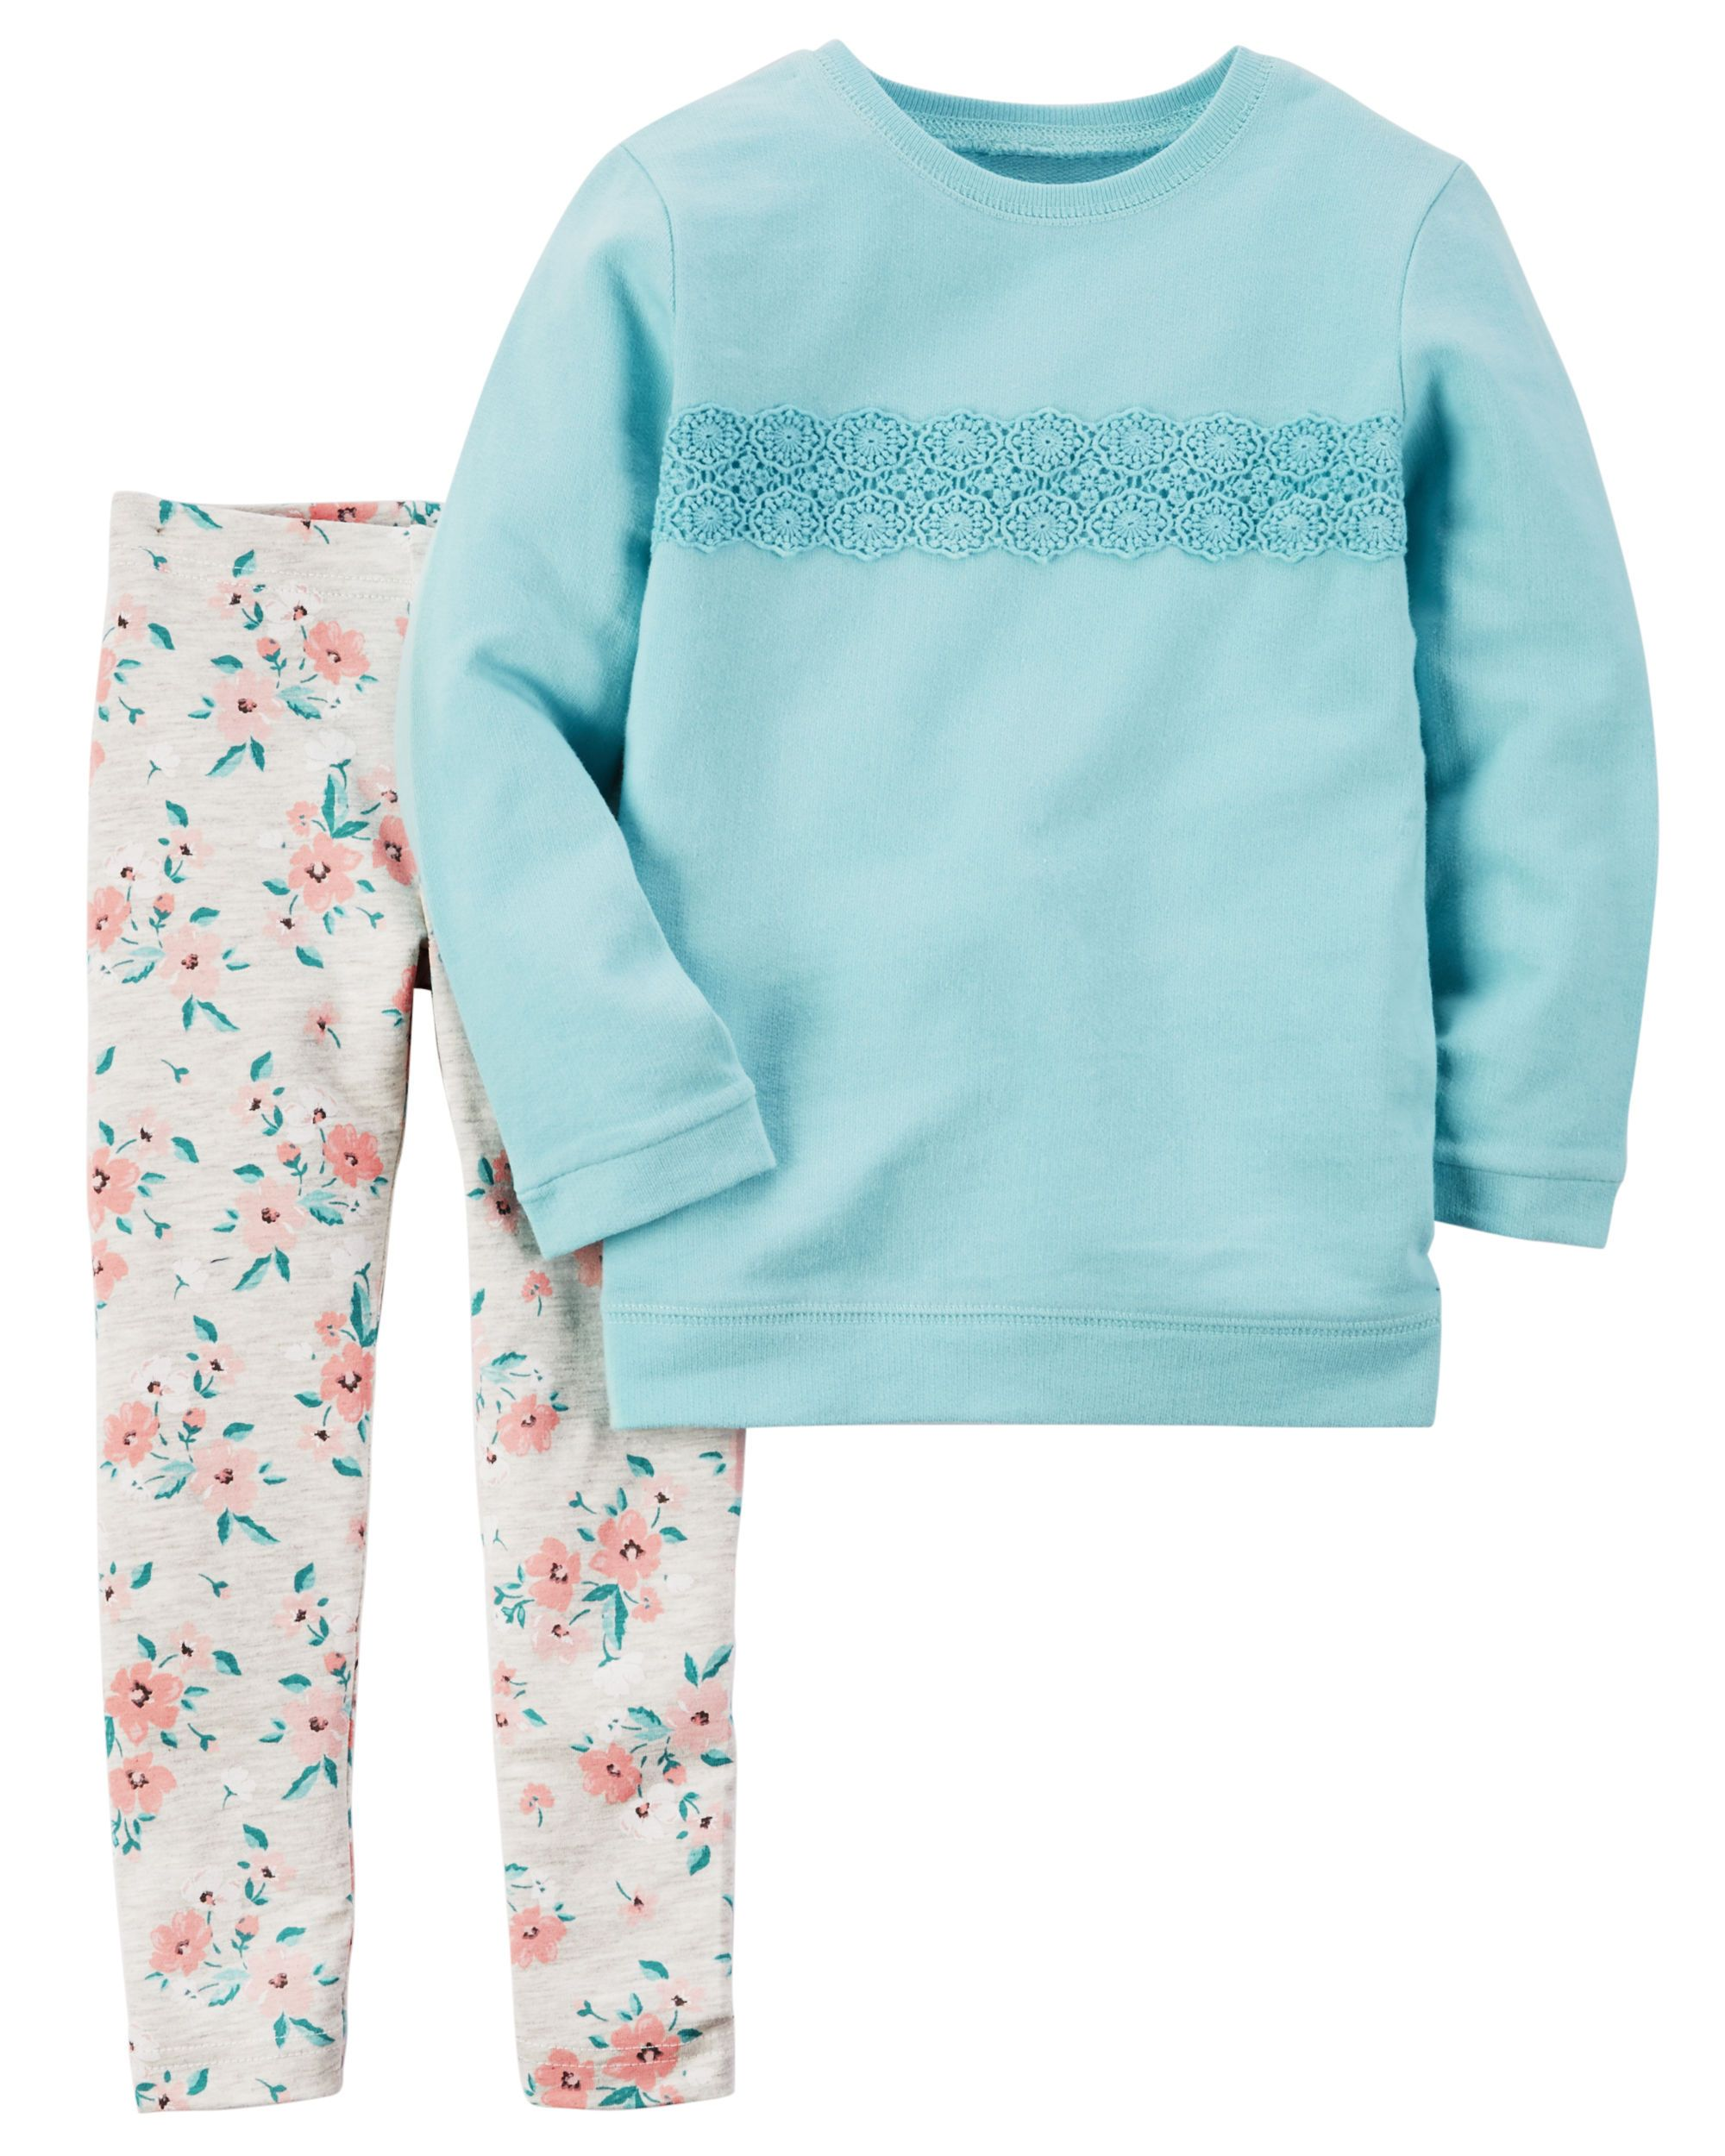 038e830d2e295 Toddler Girl 2-Piece French Terry Pullover & Legging Set | Carters.com